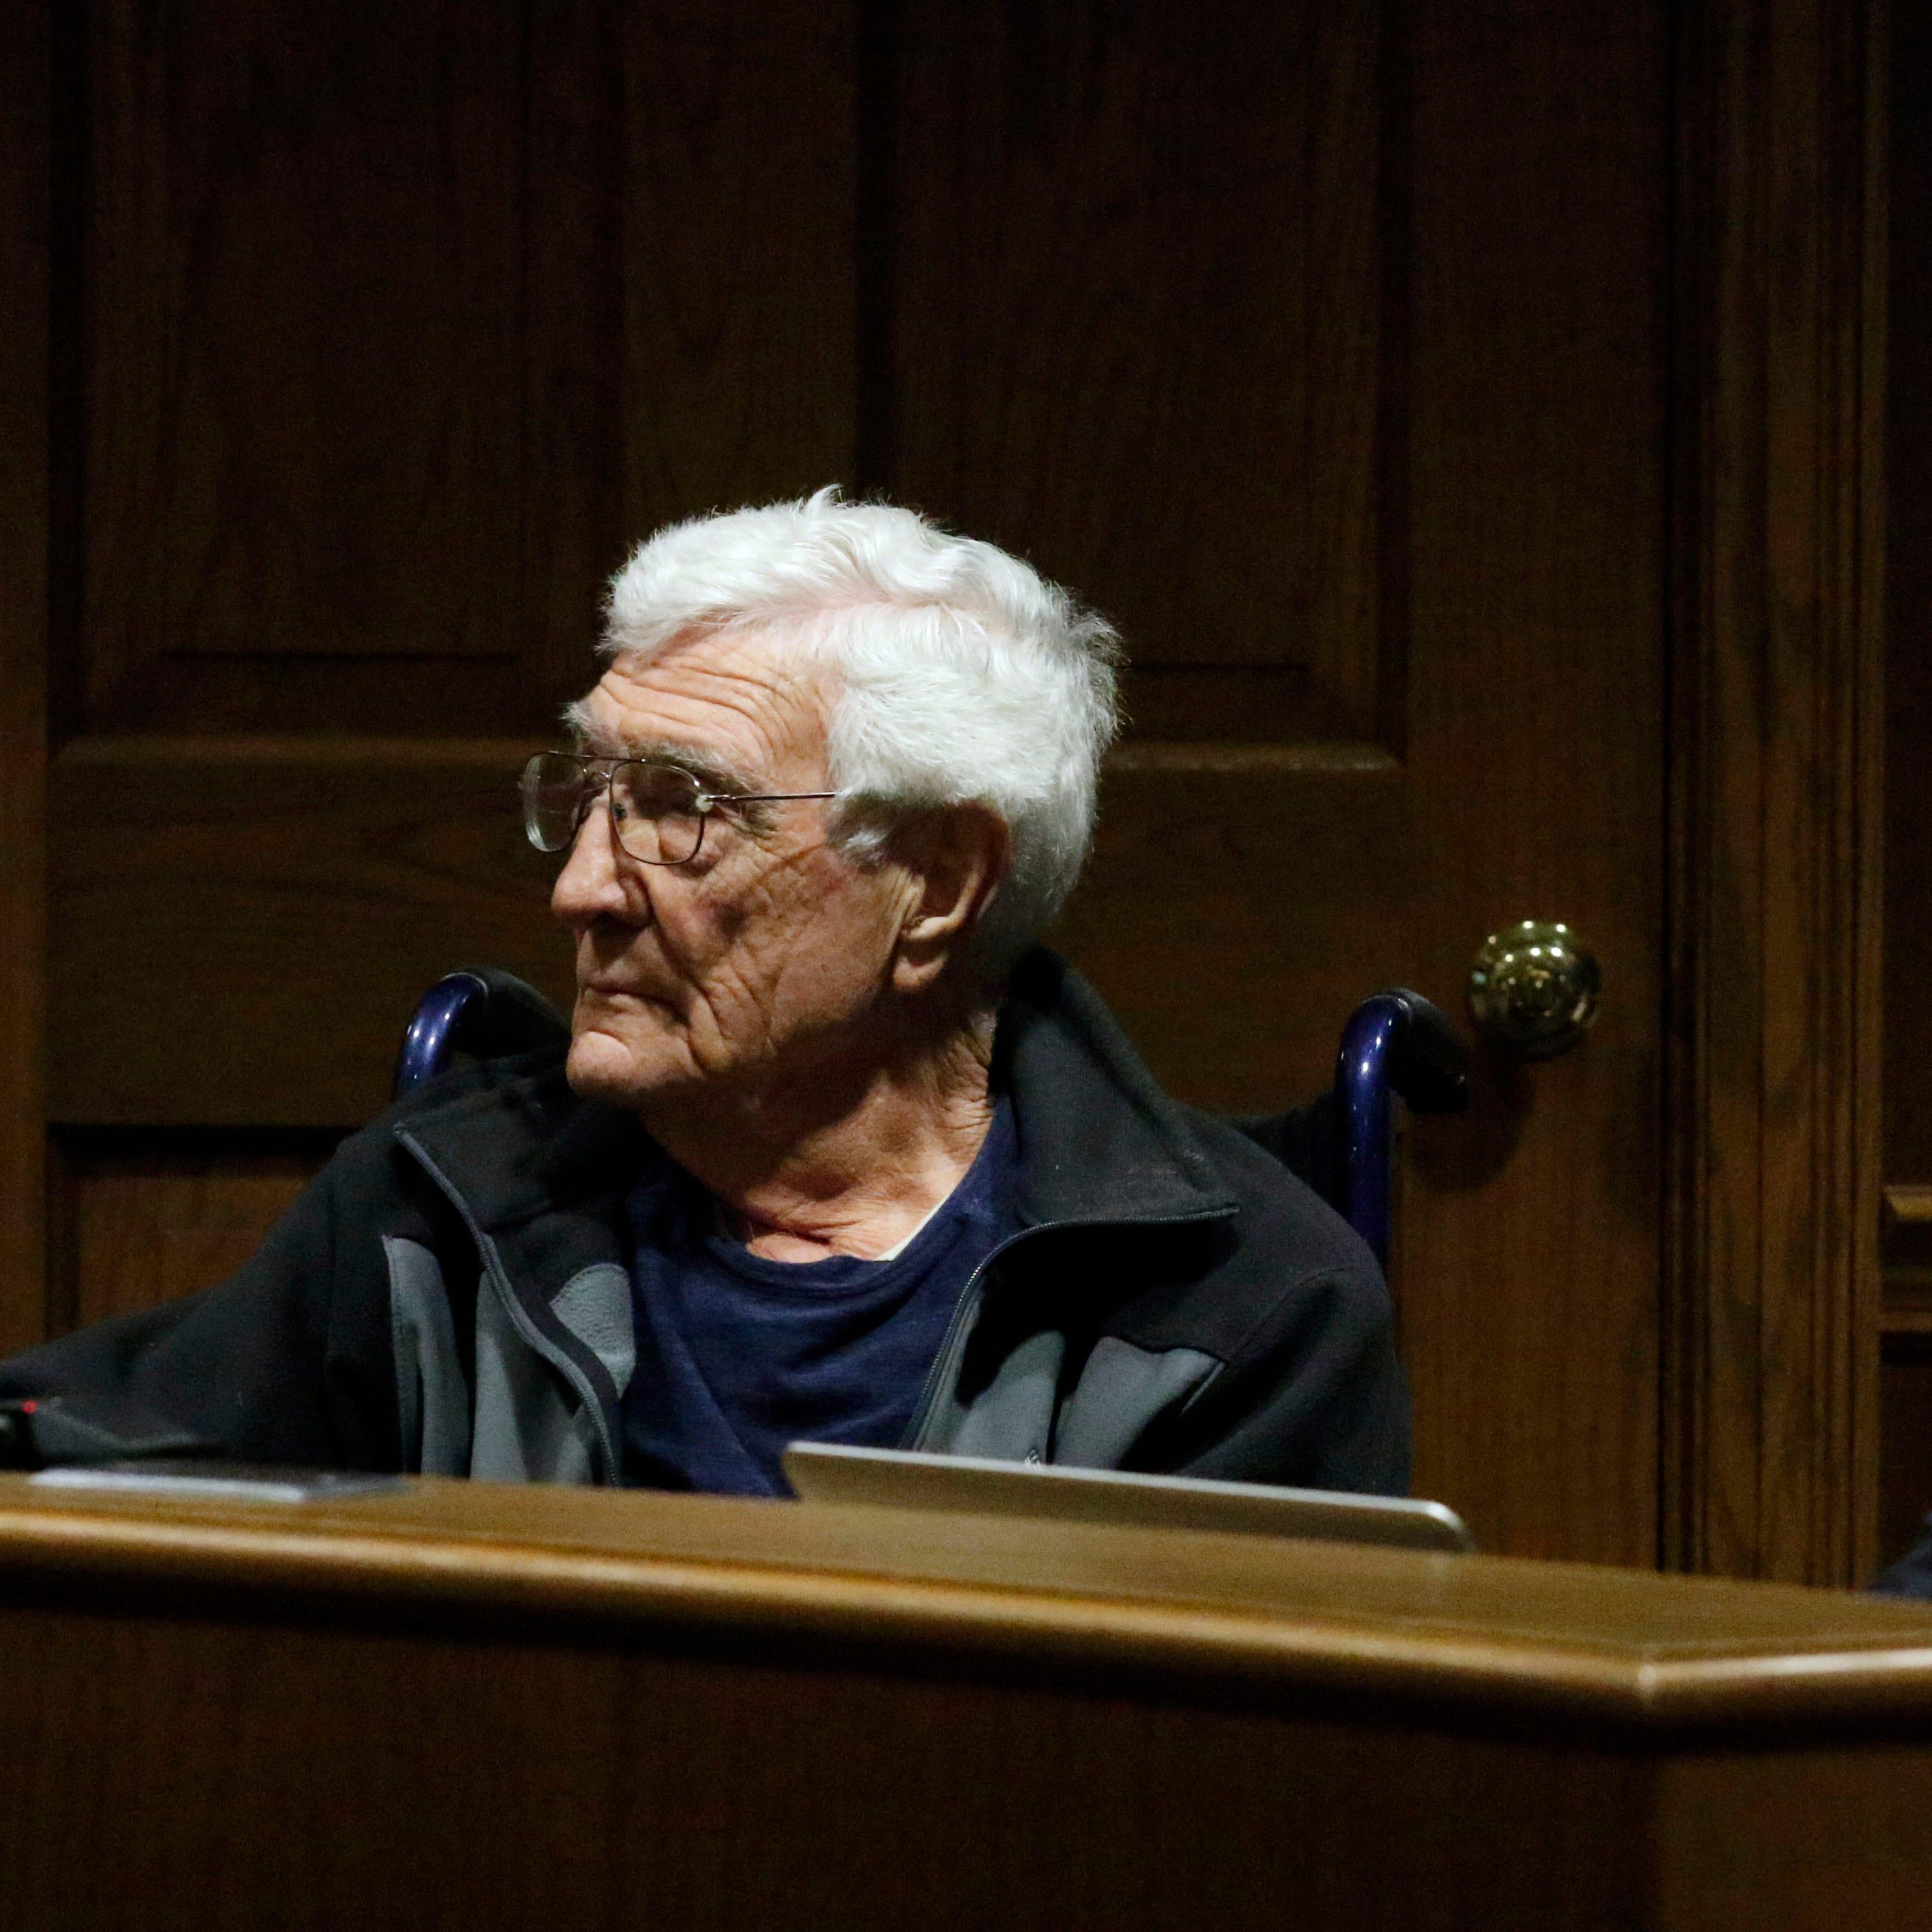 Second evaluation ordered for elderly murder suspect